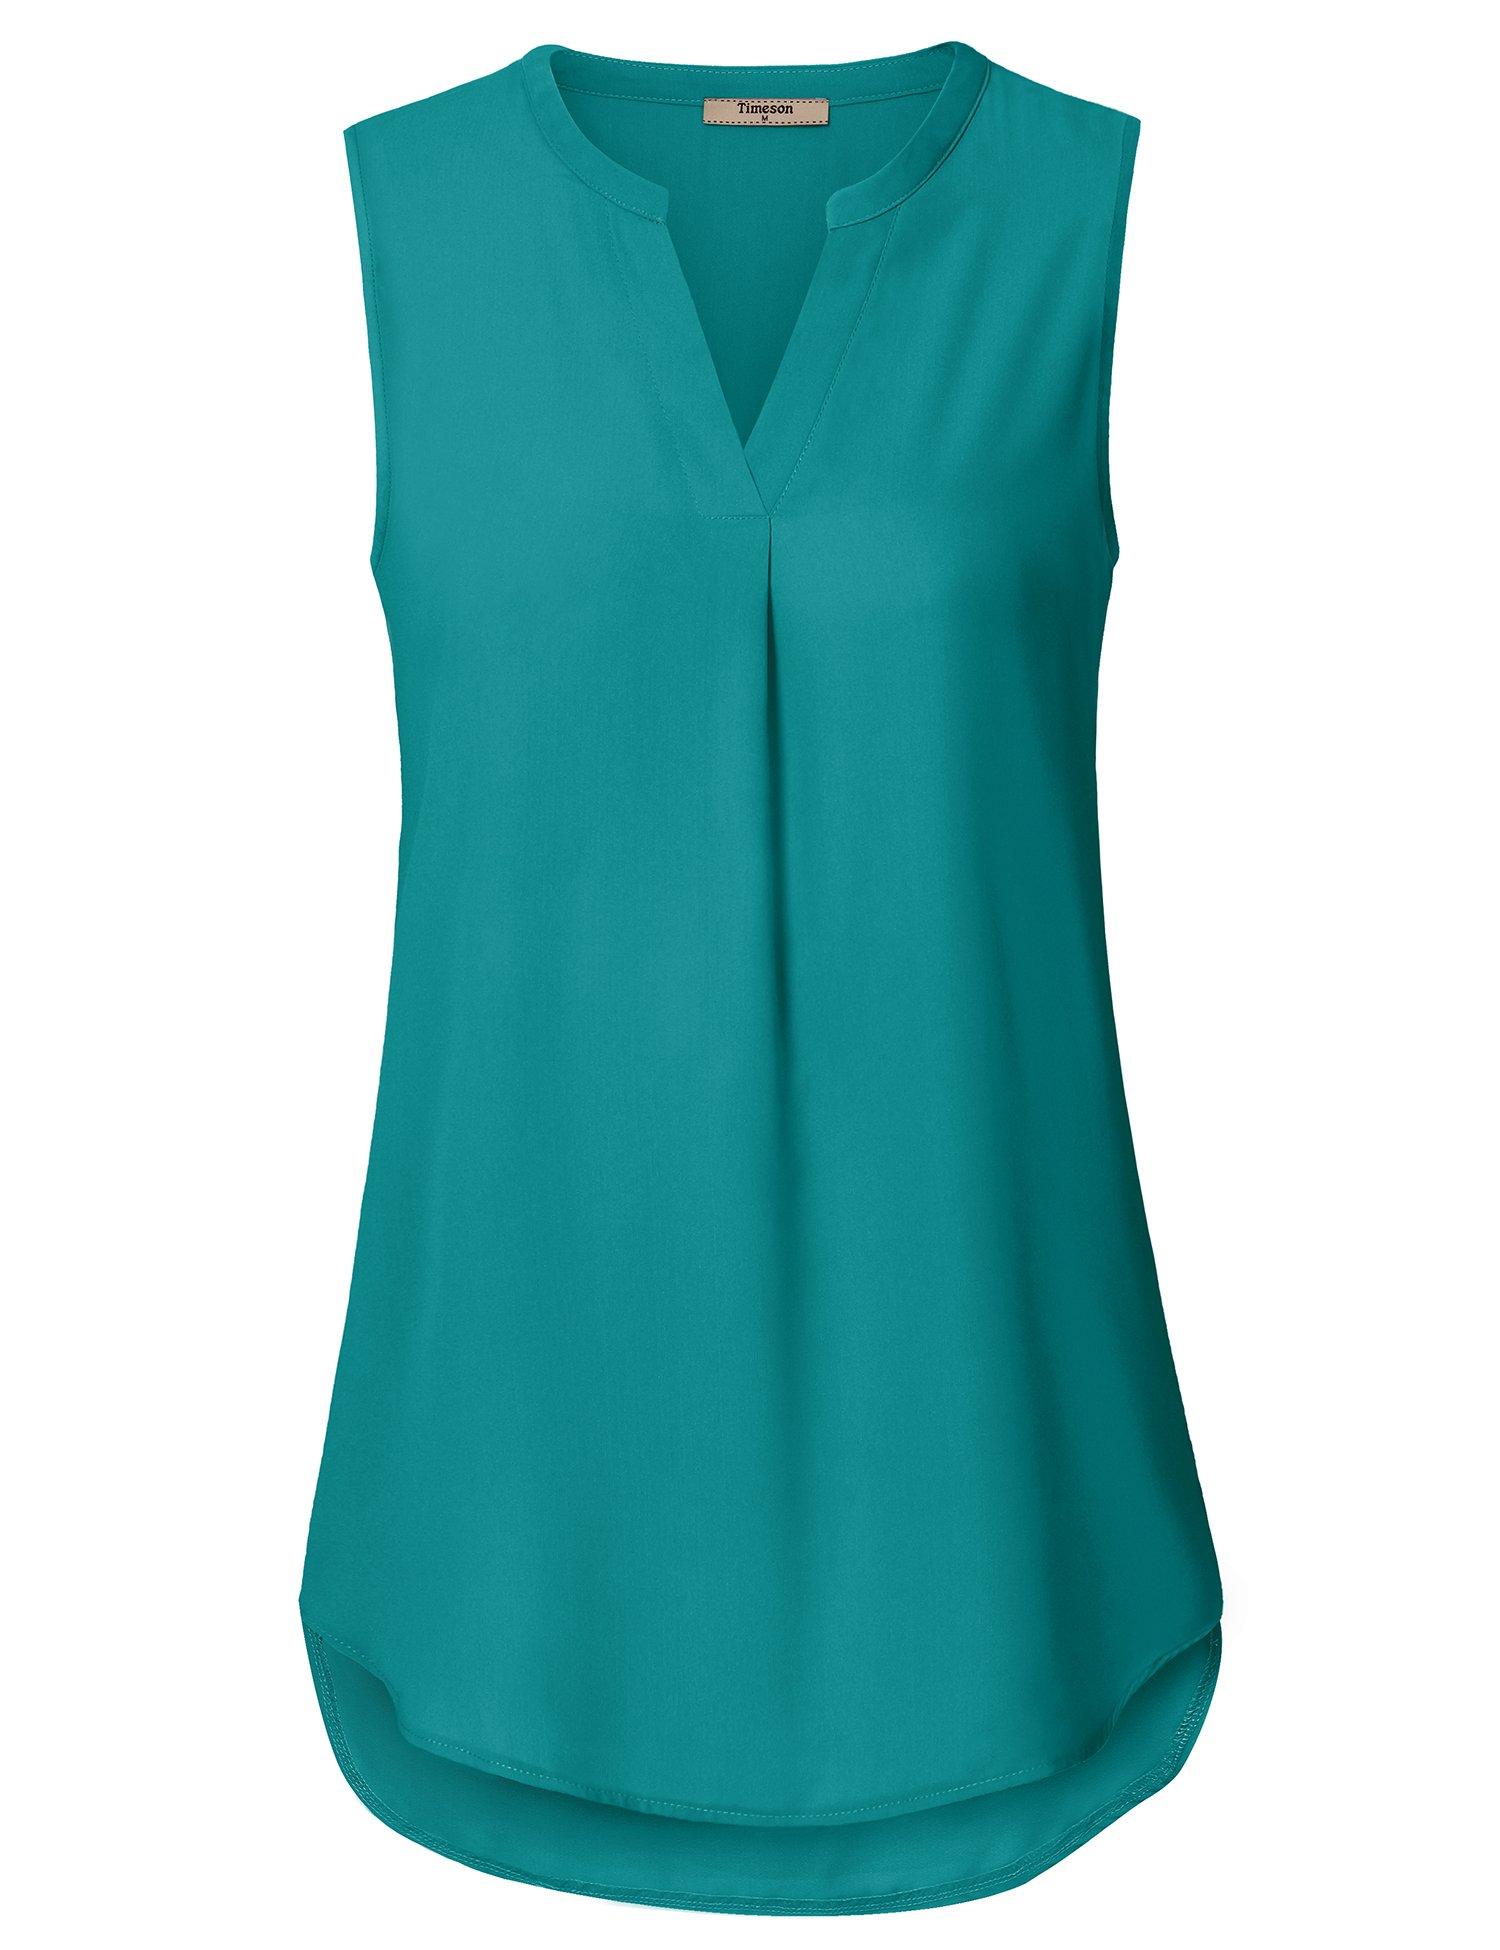 Timeson Sleeveless Tops for Women, Women's Chiffon Tank Tops Long Comfy Summer Casual Business Clothes Fashion A Line Sleeveless Tunics Shirt for Junior Deep Cyan XX-Large